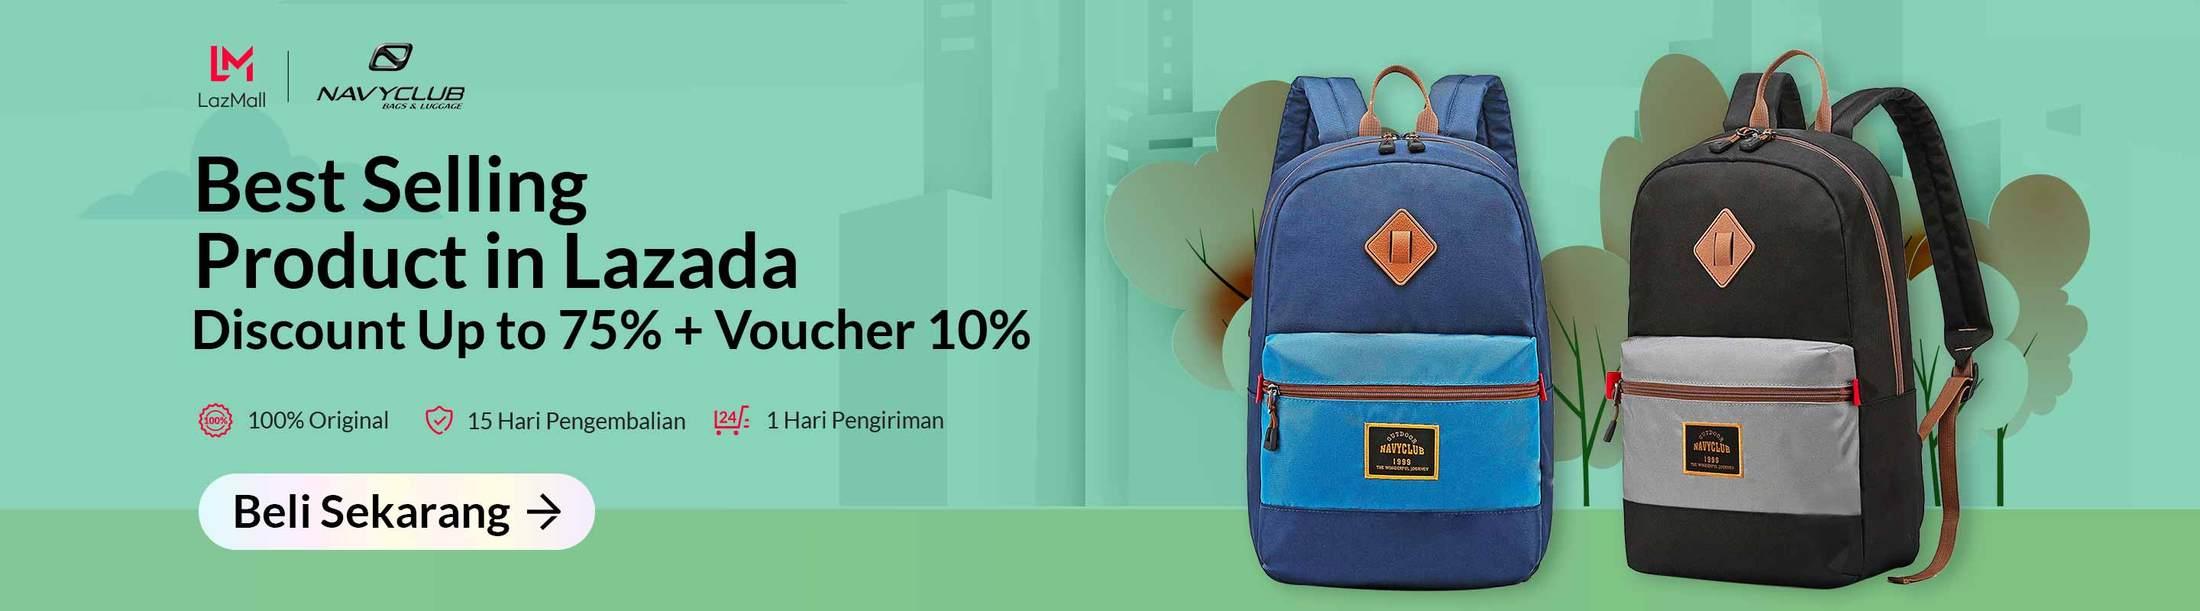 Lazada Promo Navyclub Bags & Luggage, Diskon Hingga 75%